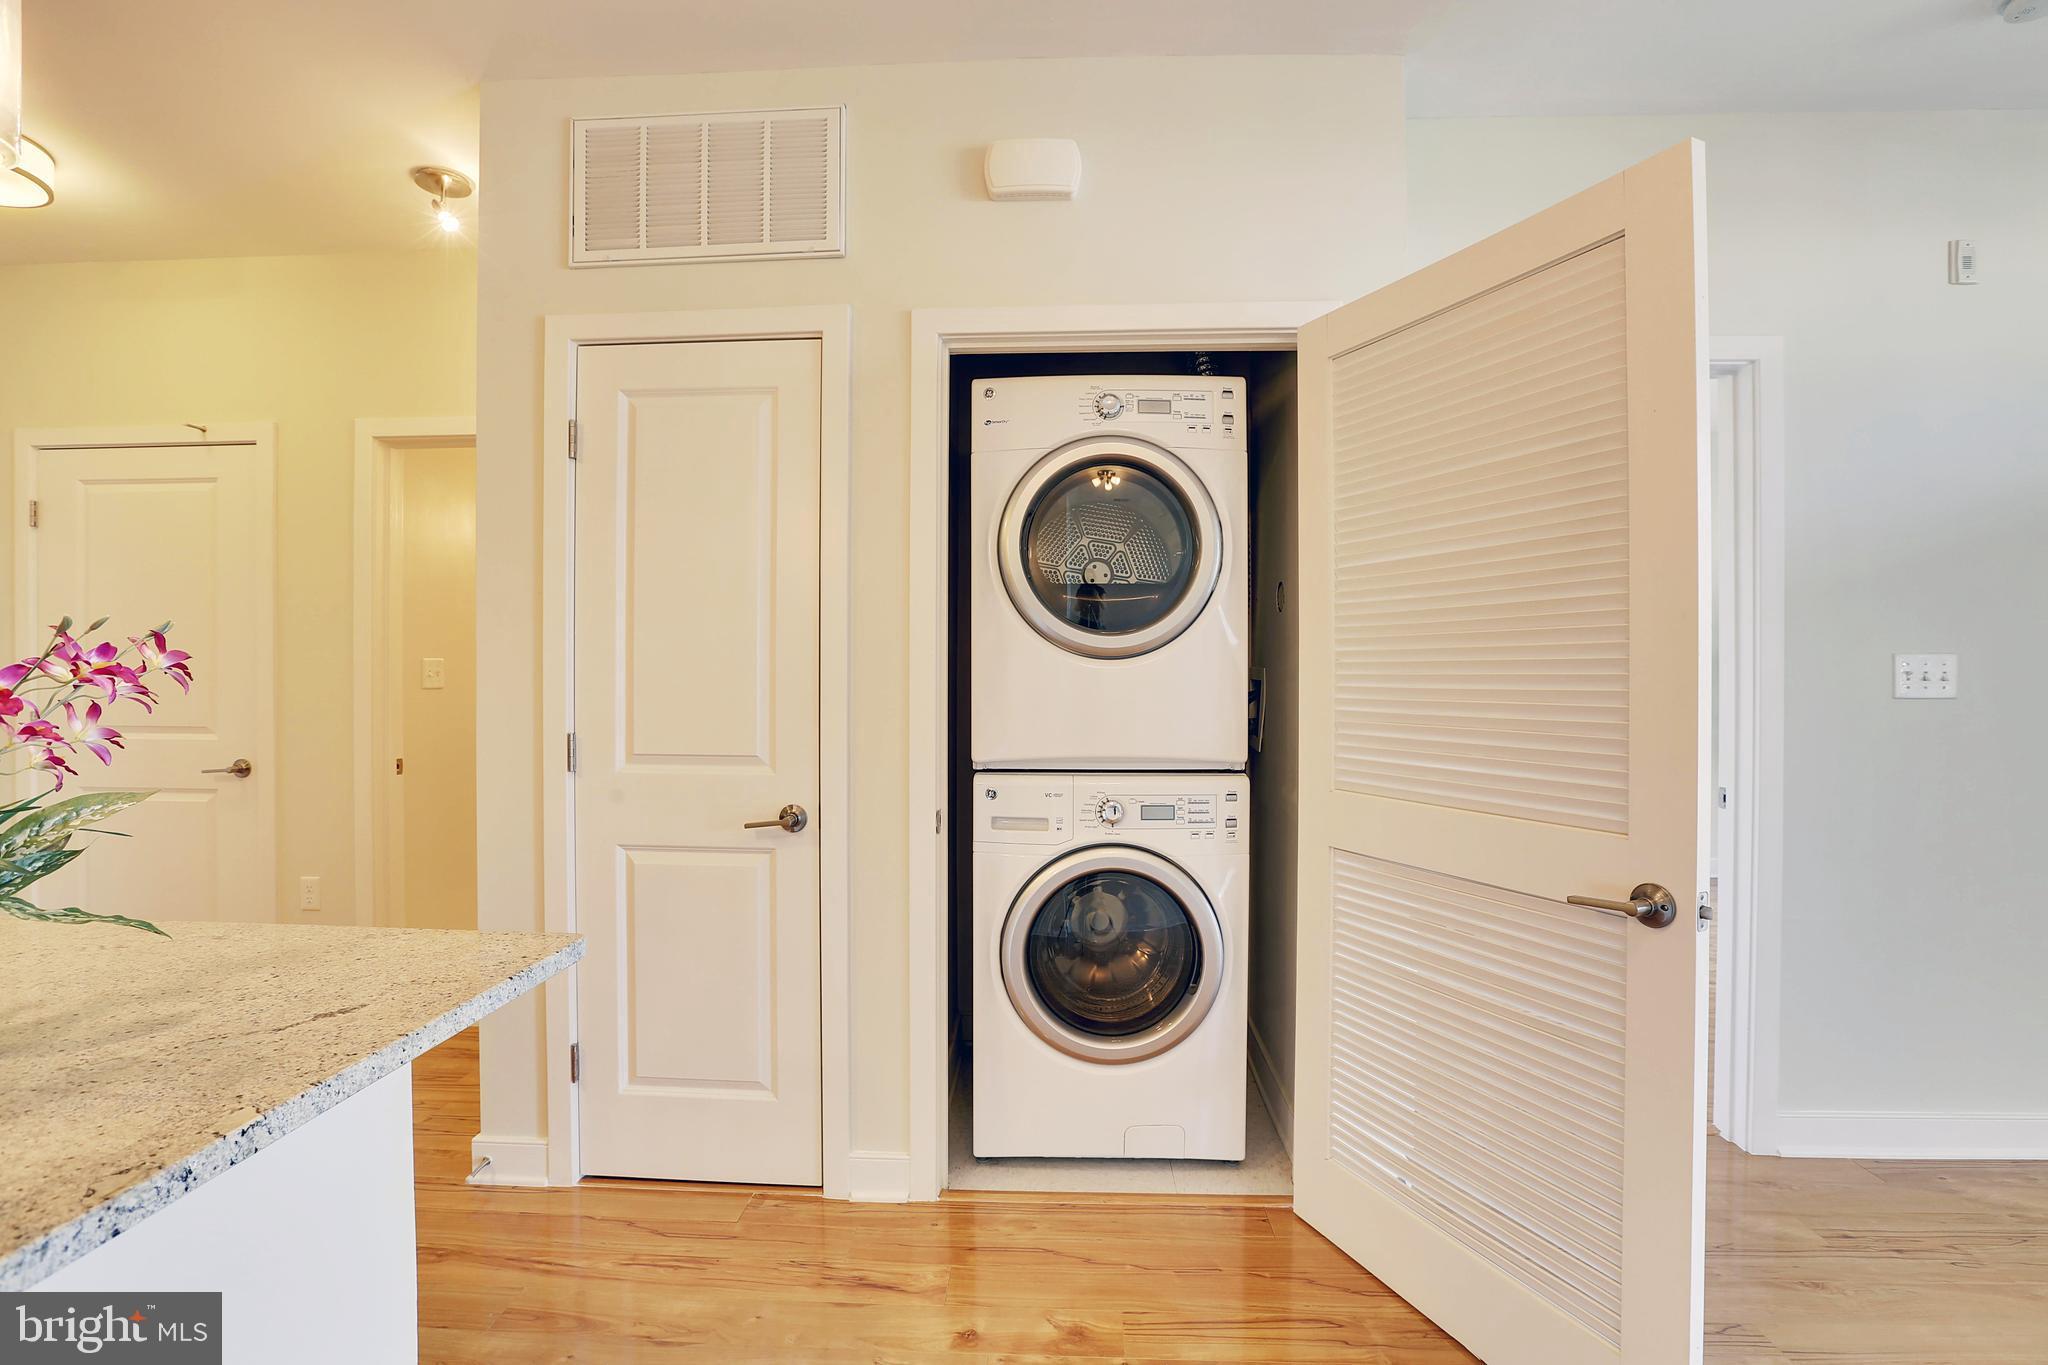 8005 13TH STREET, SILVER SPRING, Maryland 20910, 1 Bedroom Bedrooms, ,1 BathroomBathrooms,Condominium,For Sale,8005 13TH STREET,MDMC747960